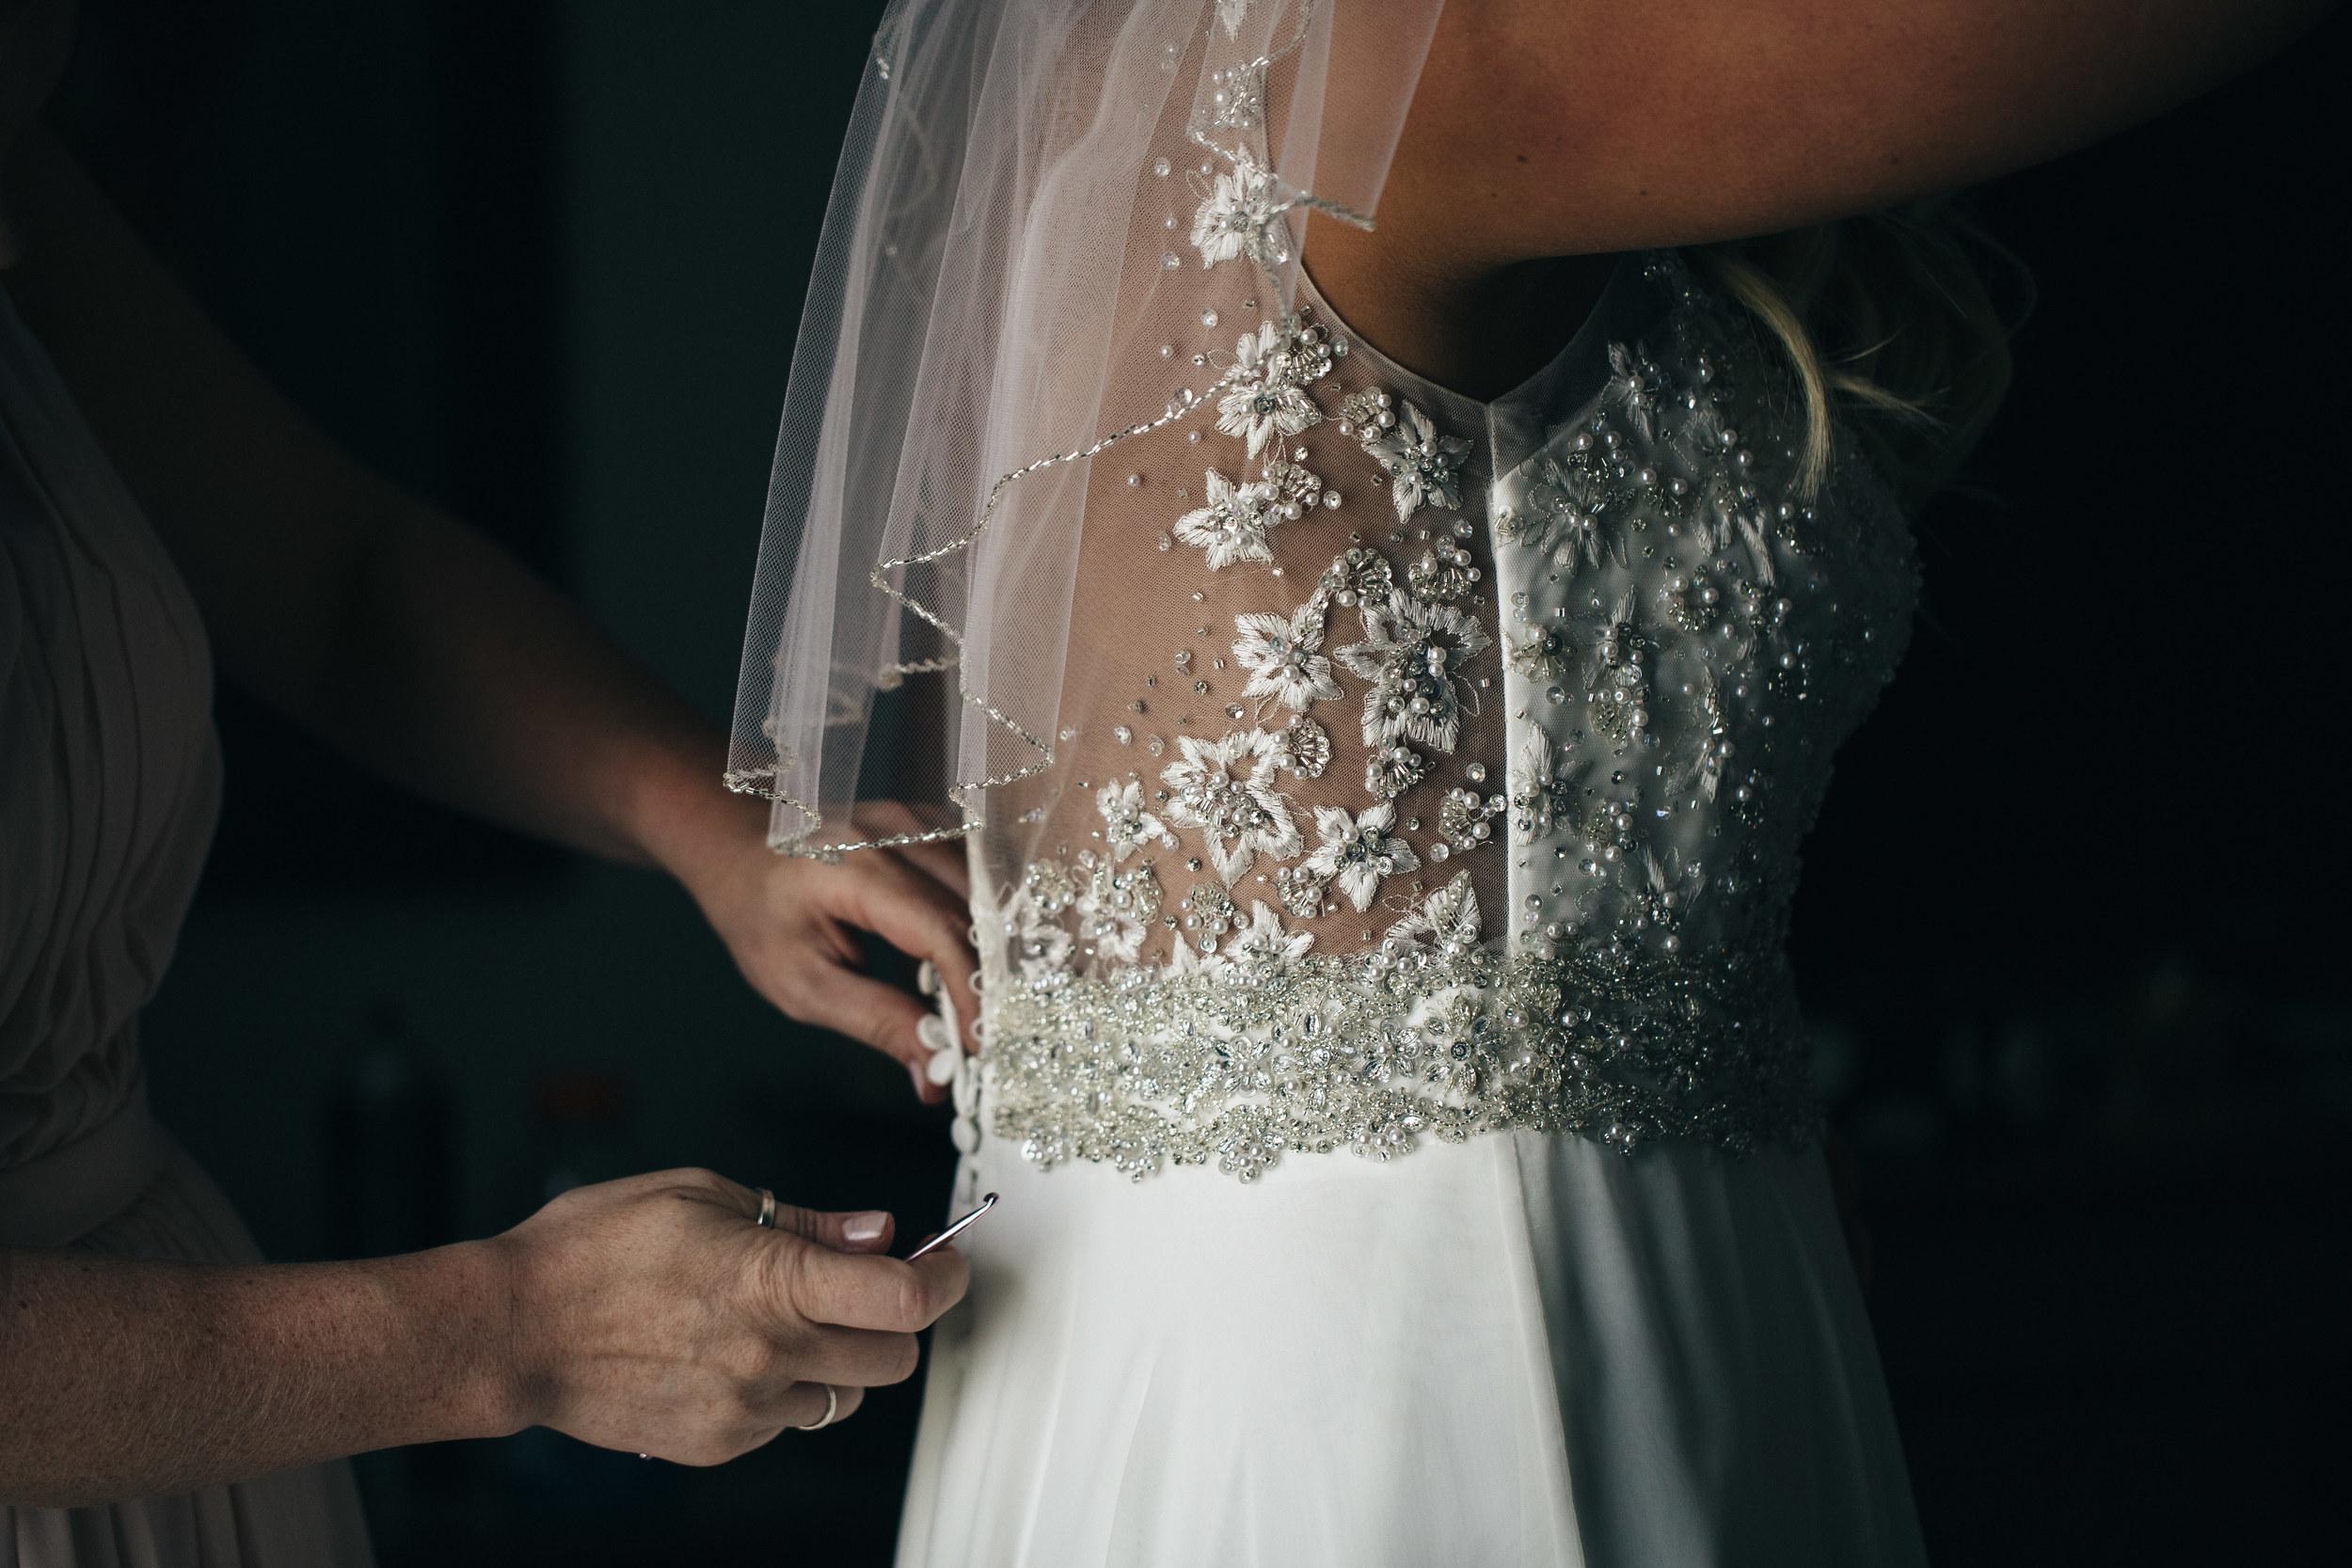 Photo of beautiful lace detail on wedding dress.